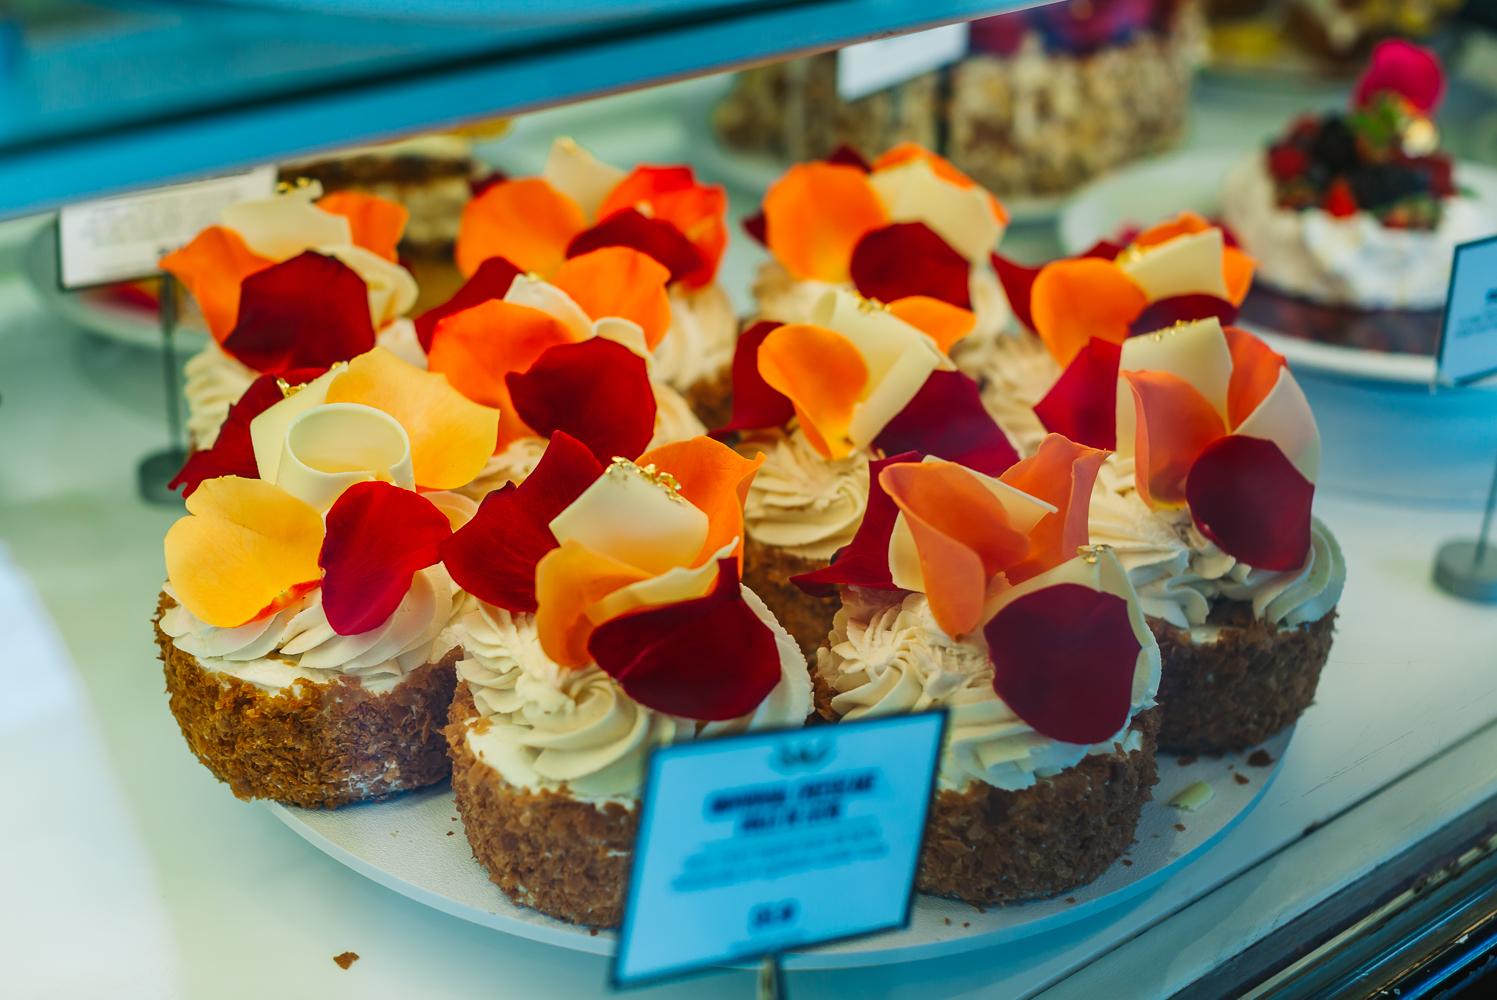 Extraordinary+Dessert+Little+Italy+San+Diego #ExtraordinaryDesserts